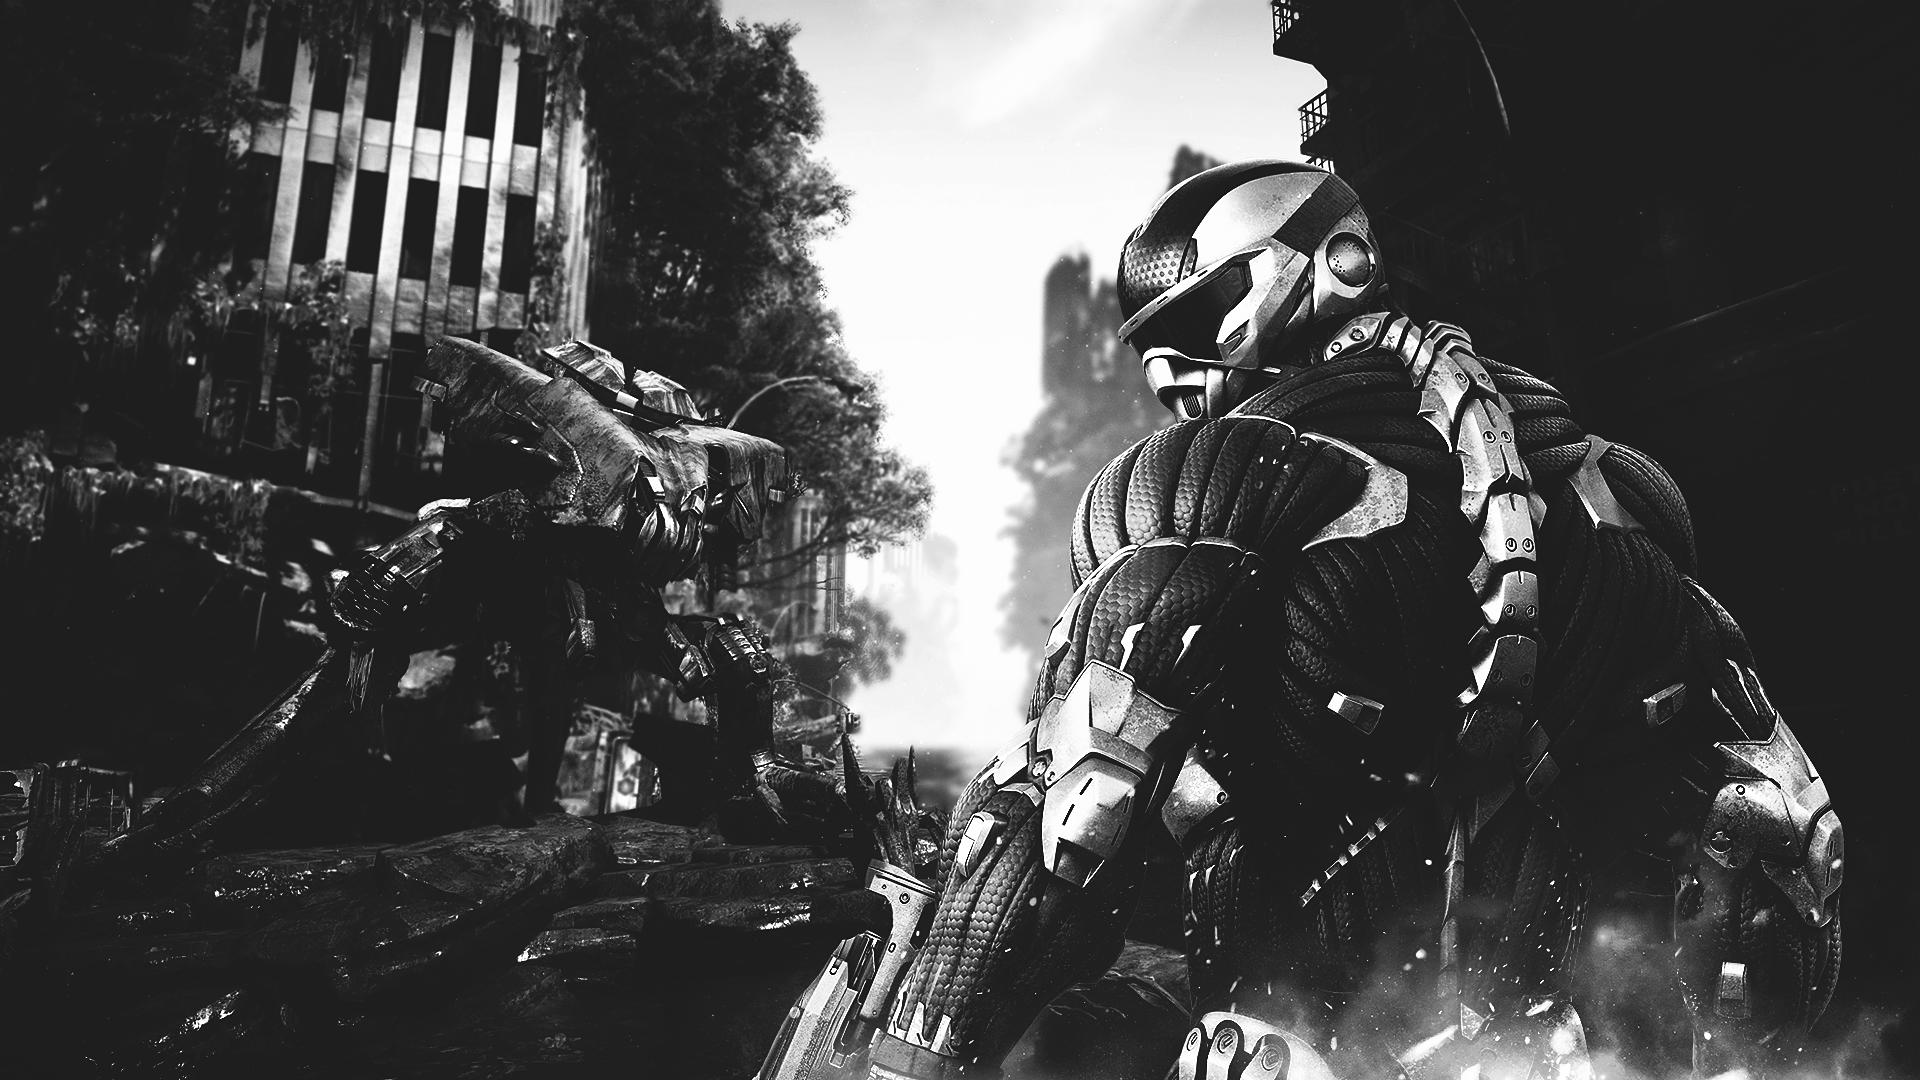 Crysis by GFX-3ngine